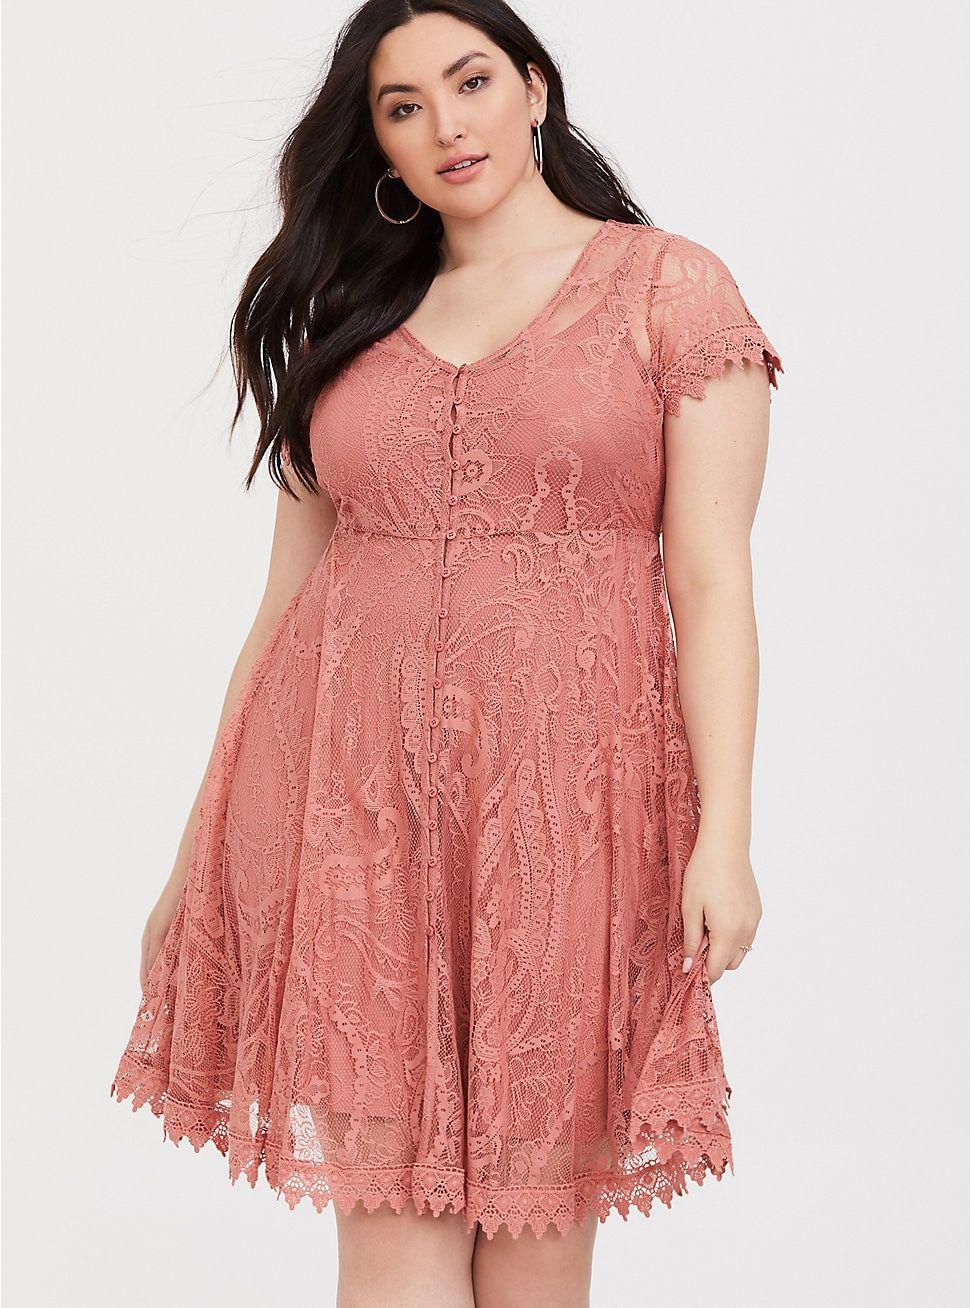 Blush Pink Lace Button Shirt Dress Button Shirt Dress Blush Lace Dress Plus Size Cocktail Dresses